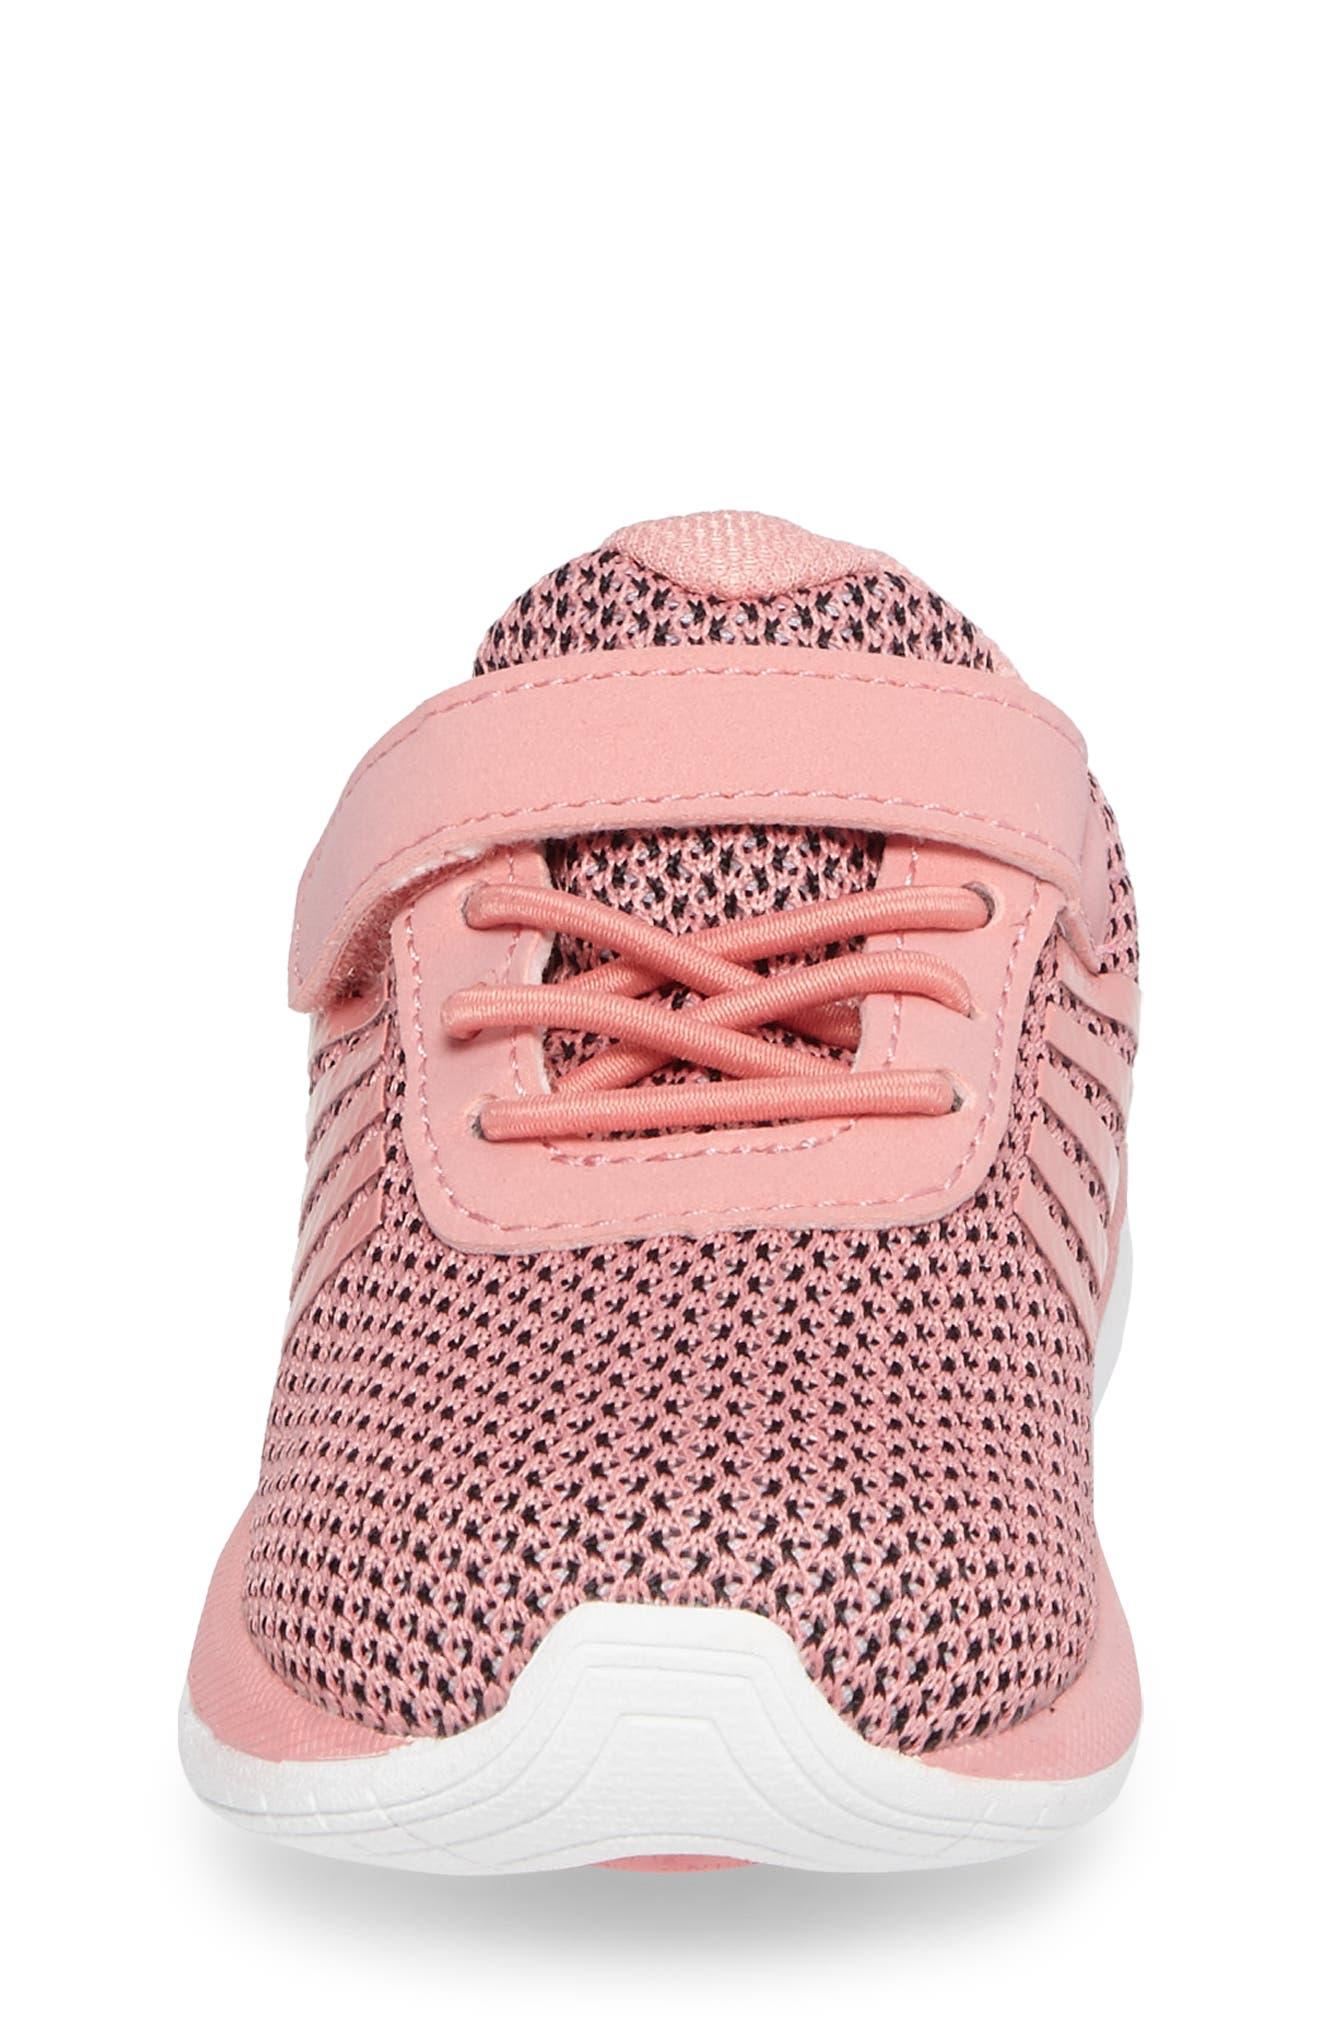 Tubes Infinity Sneaker,                             Alternate thumbnail 4, color,                             Flamingo Pink/ White